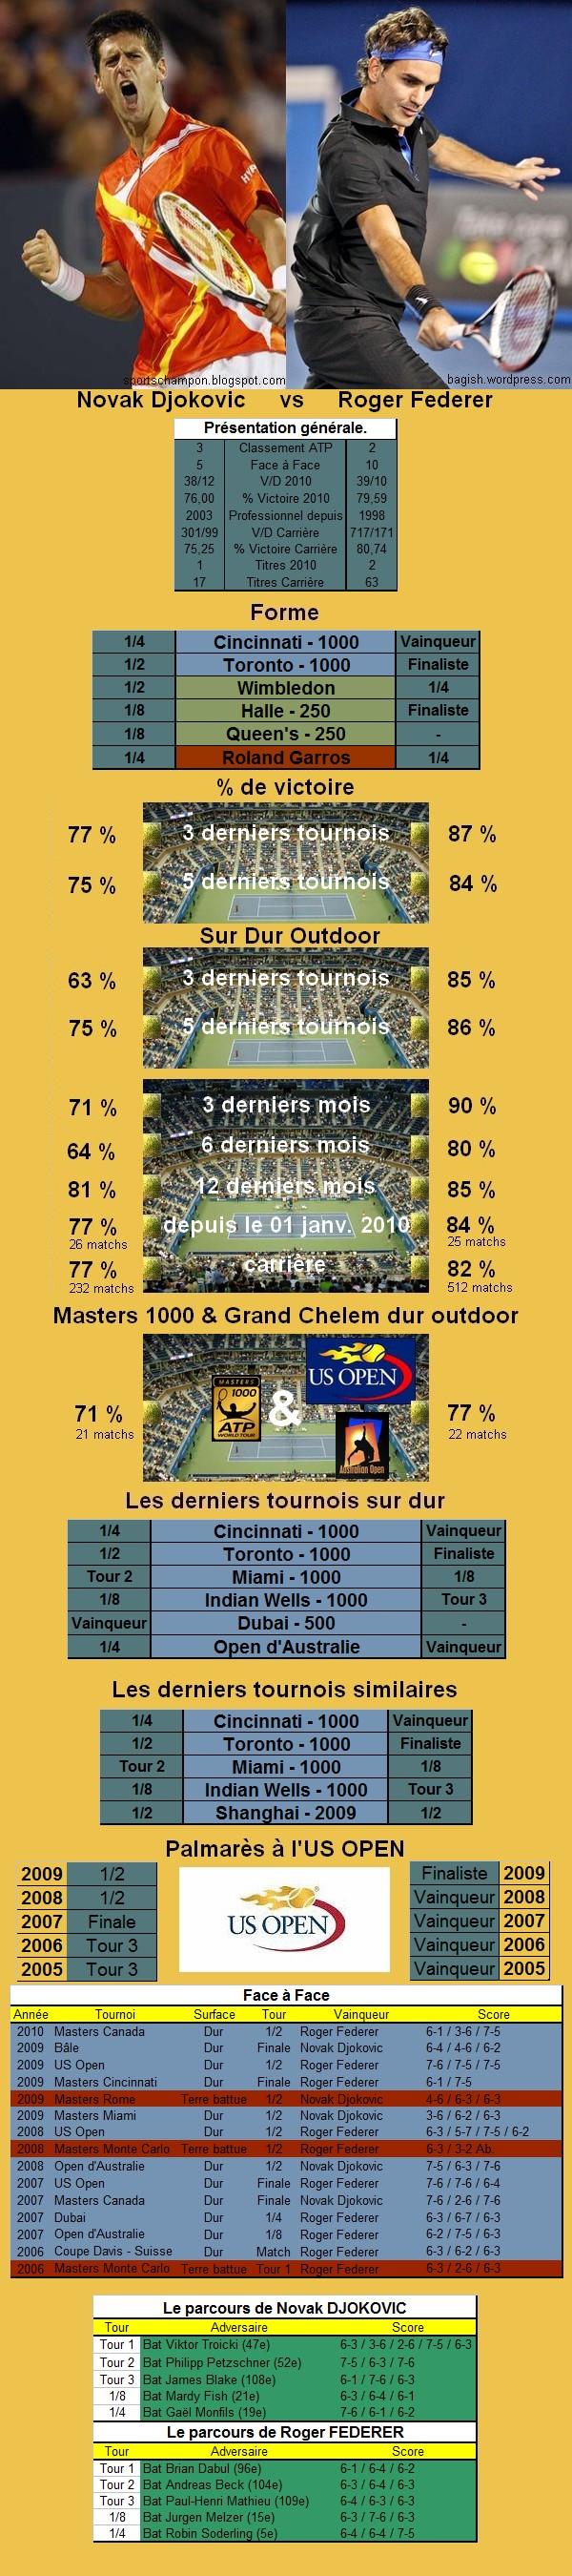 Statistiques tennis de Djokovic contre Federer à l'US OPEN